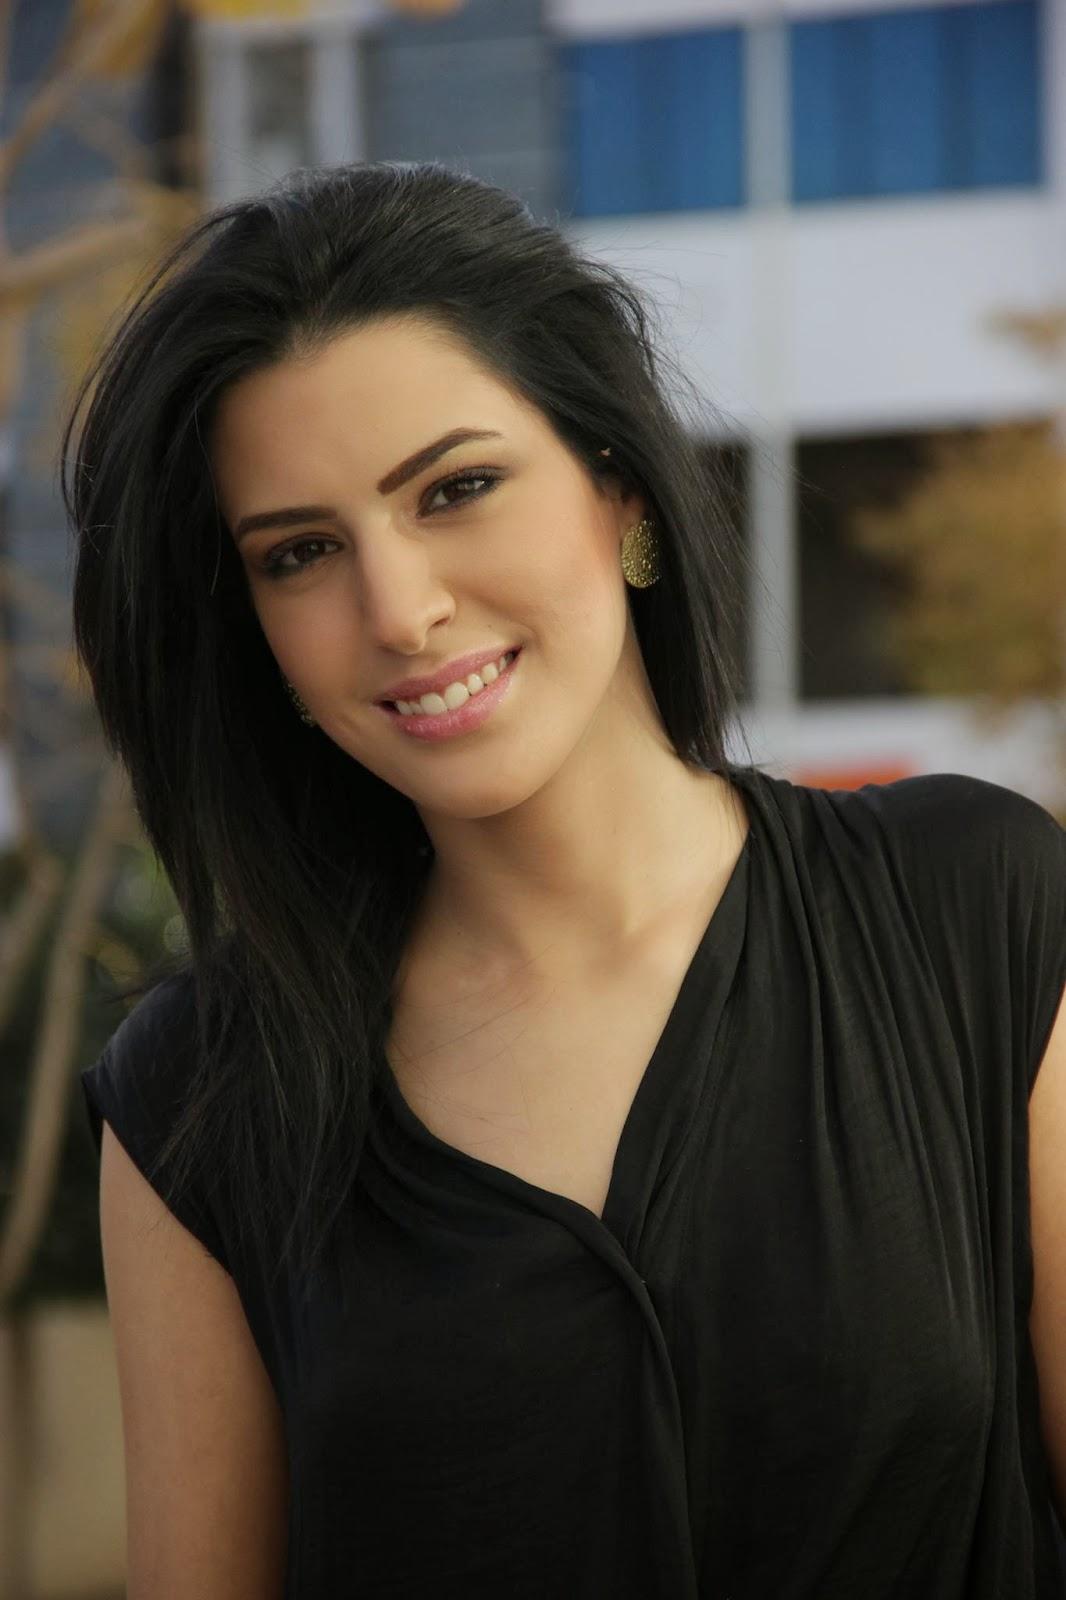 Mannequin tunisie candidates pour le titre miss tunisie 2014 - Prenom mayssa ...